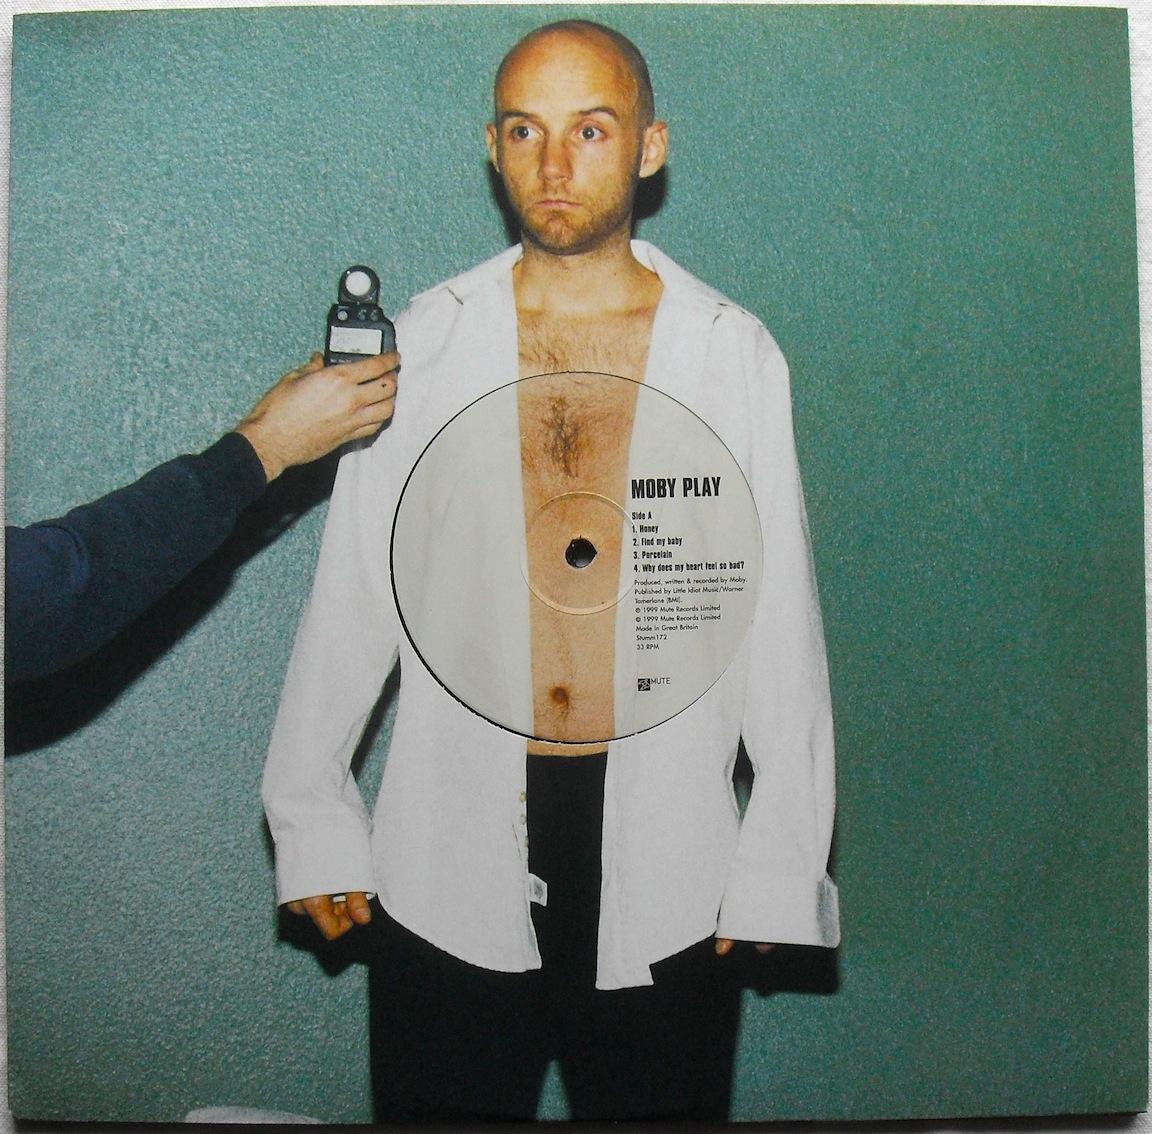 Art Skool Damage Christian Montone Vinyl Therapy Moby